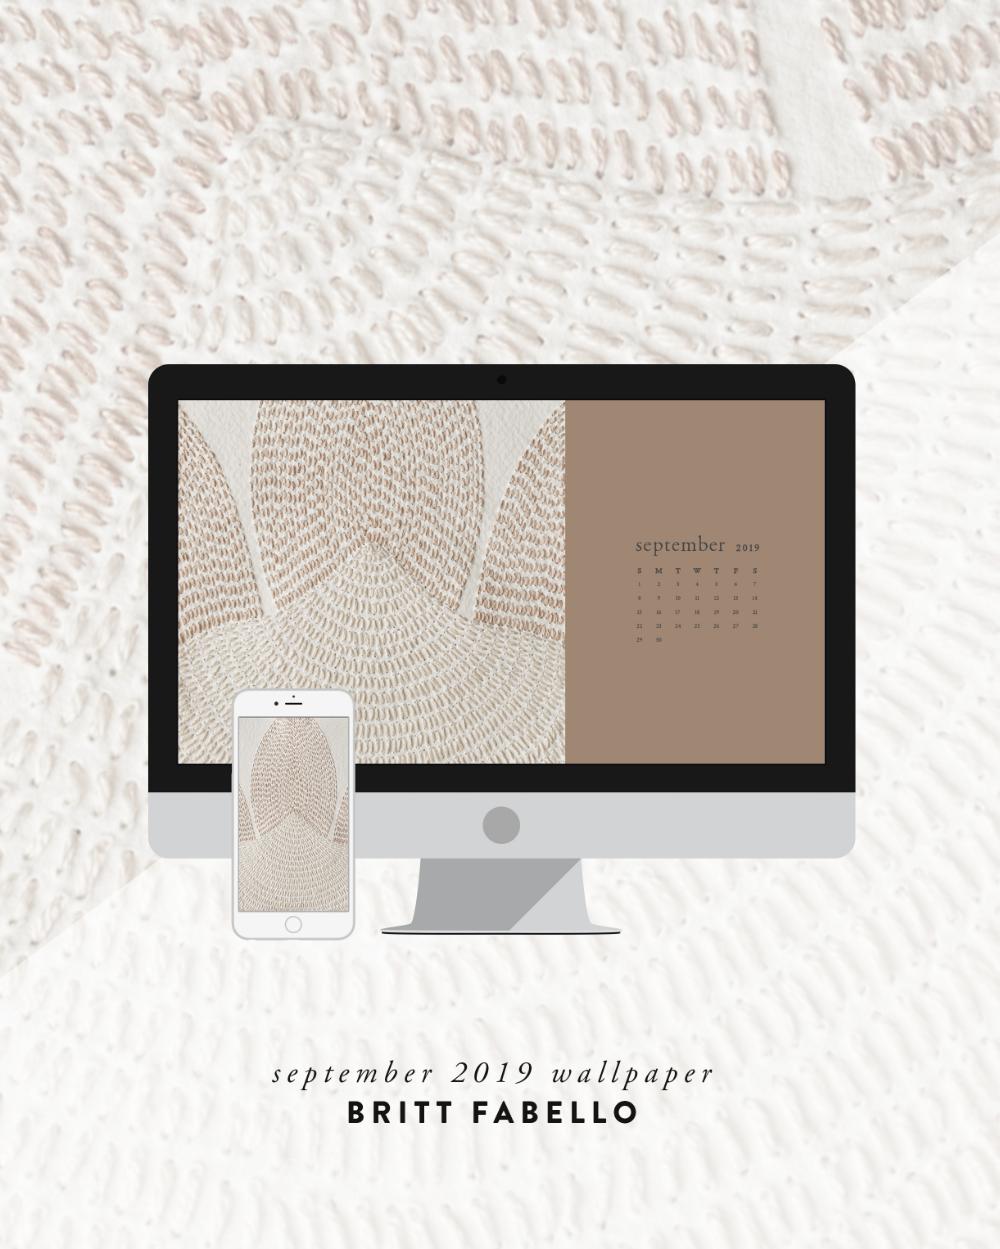 Wallpaper: September 2019 Calendar & Artwork — Britt Fabello